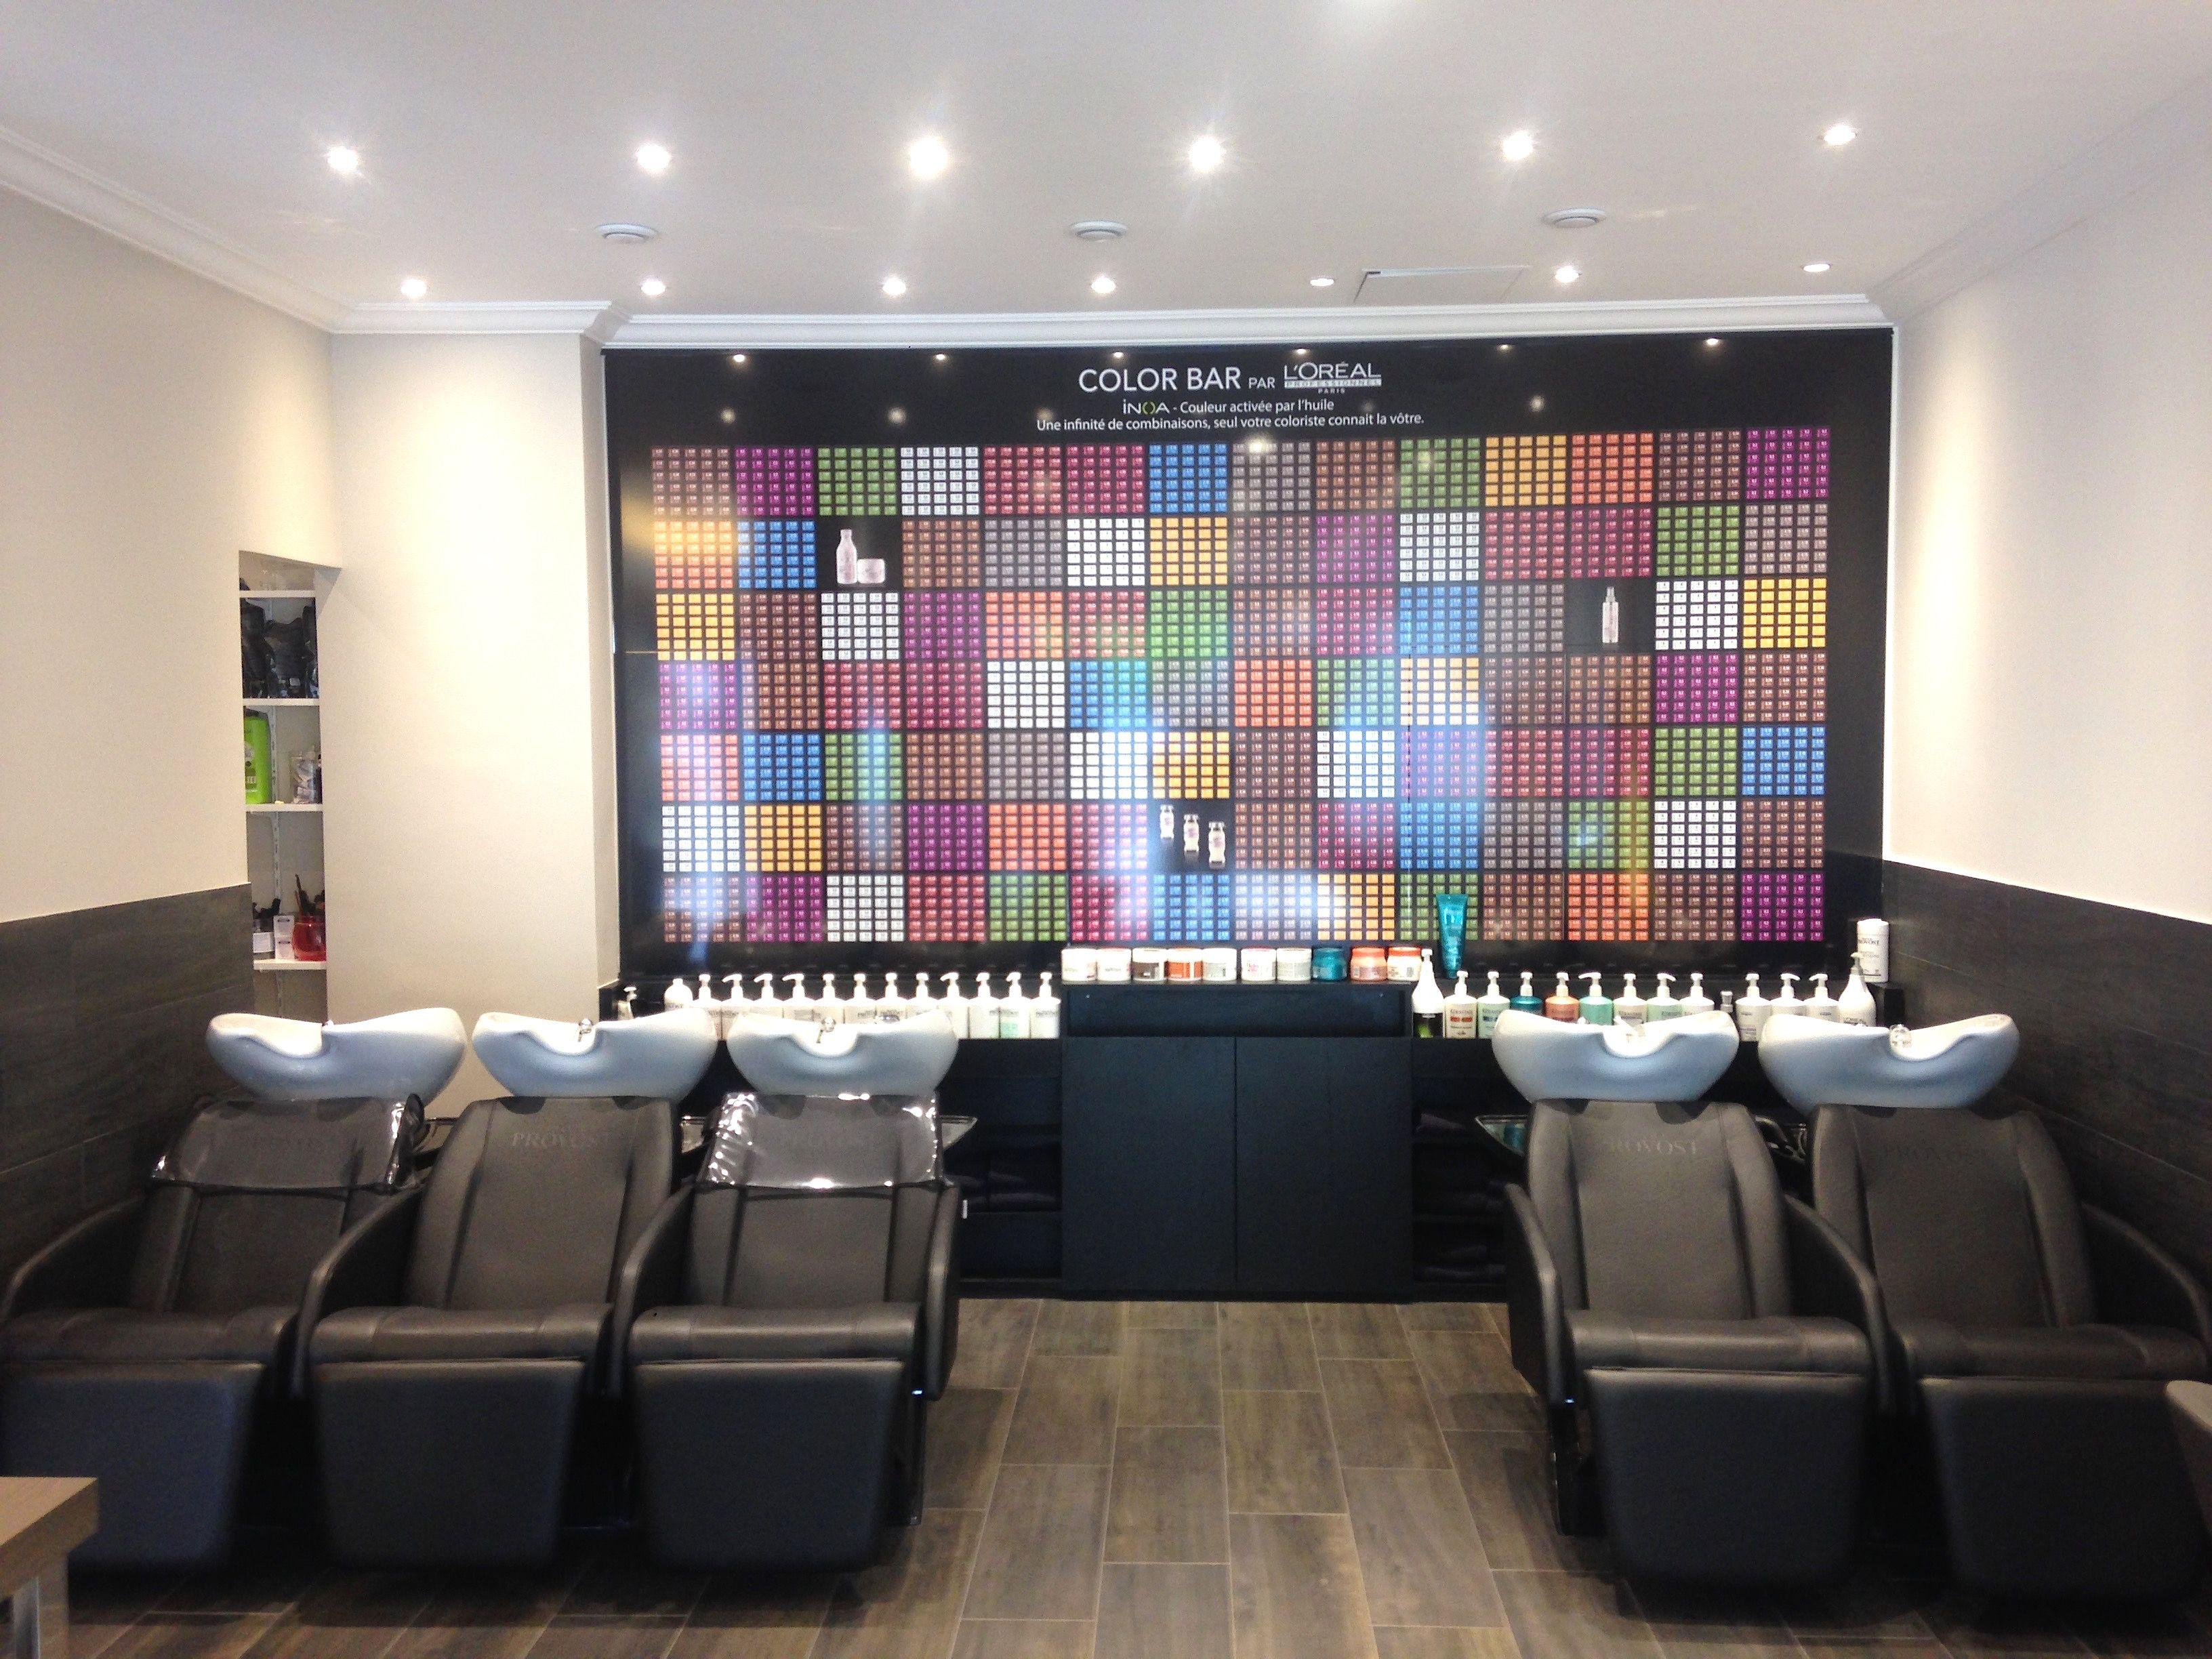 95 best salons coiffure images on Pinterest   Salon ideas ...